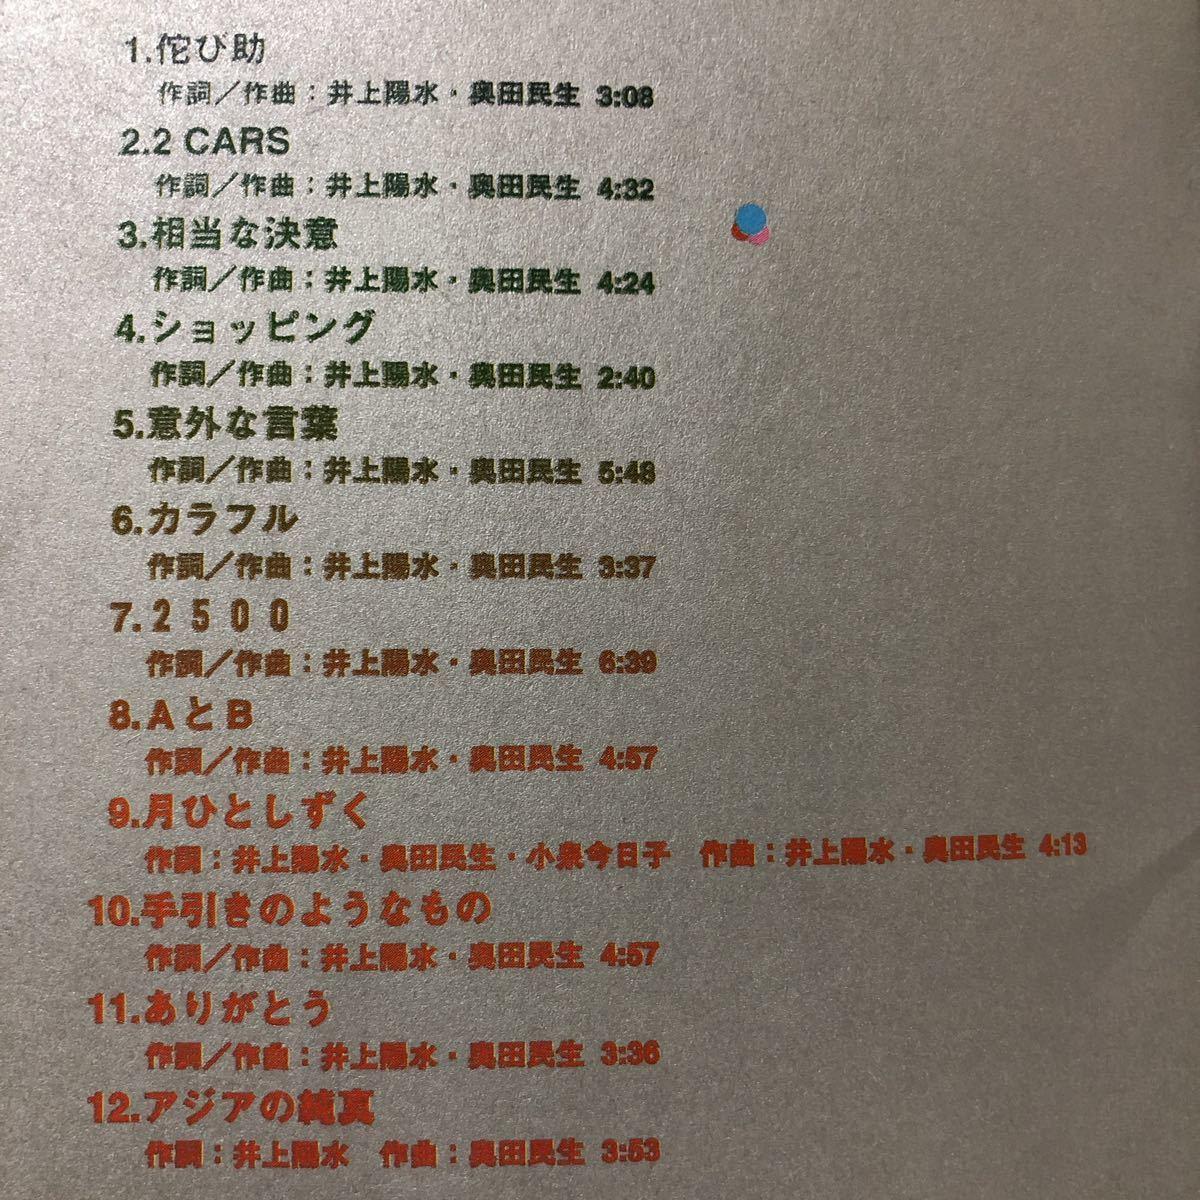 CD 蔵出し-396【Jポップ】(レンタルおち) ショッピング / 井上陽水.奥田民生_画像4